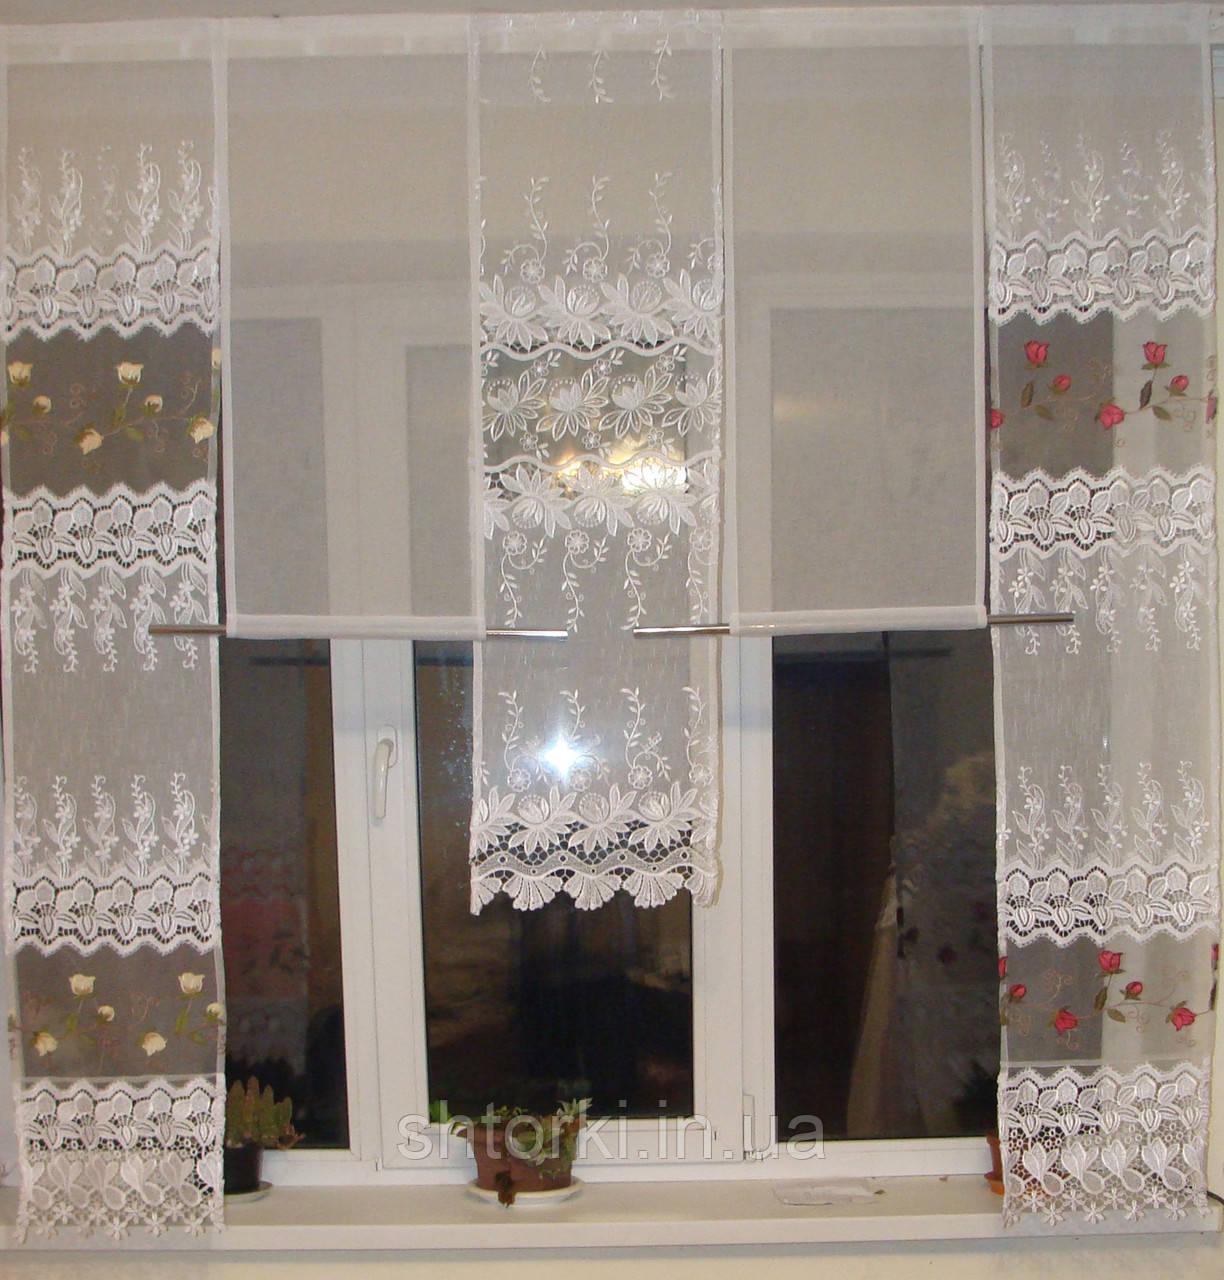 Панельки купон с розочками, 1,5м